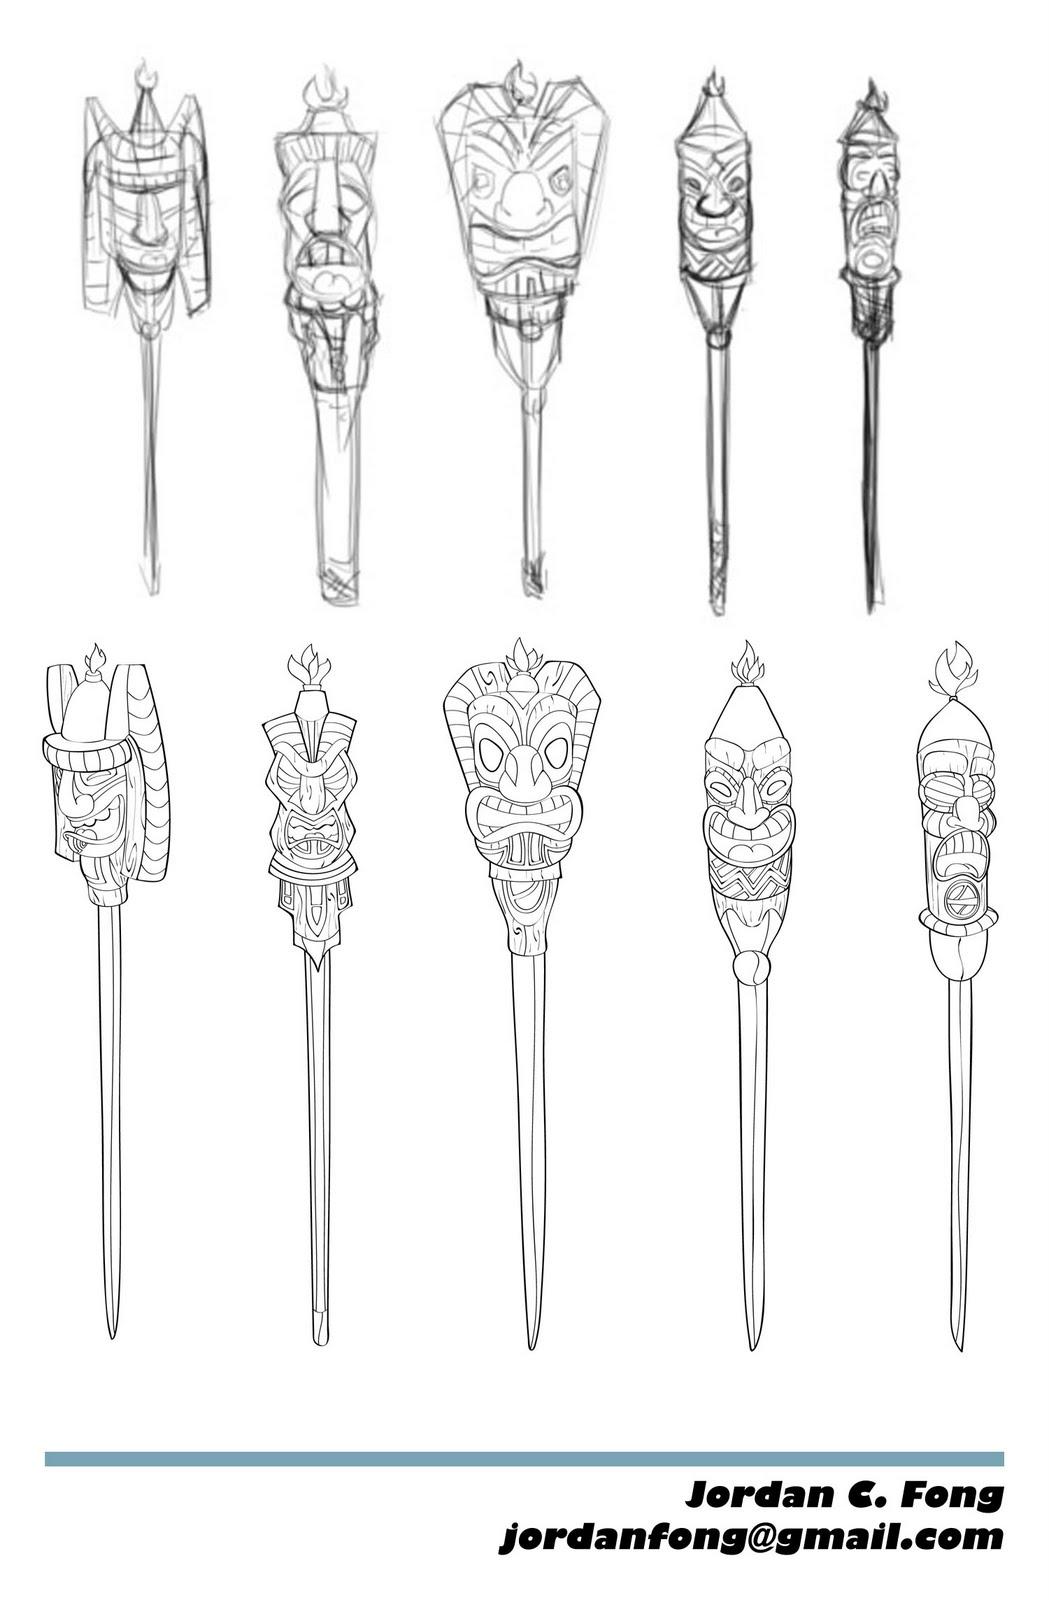 Sketch Hound Tiki Torch Time